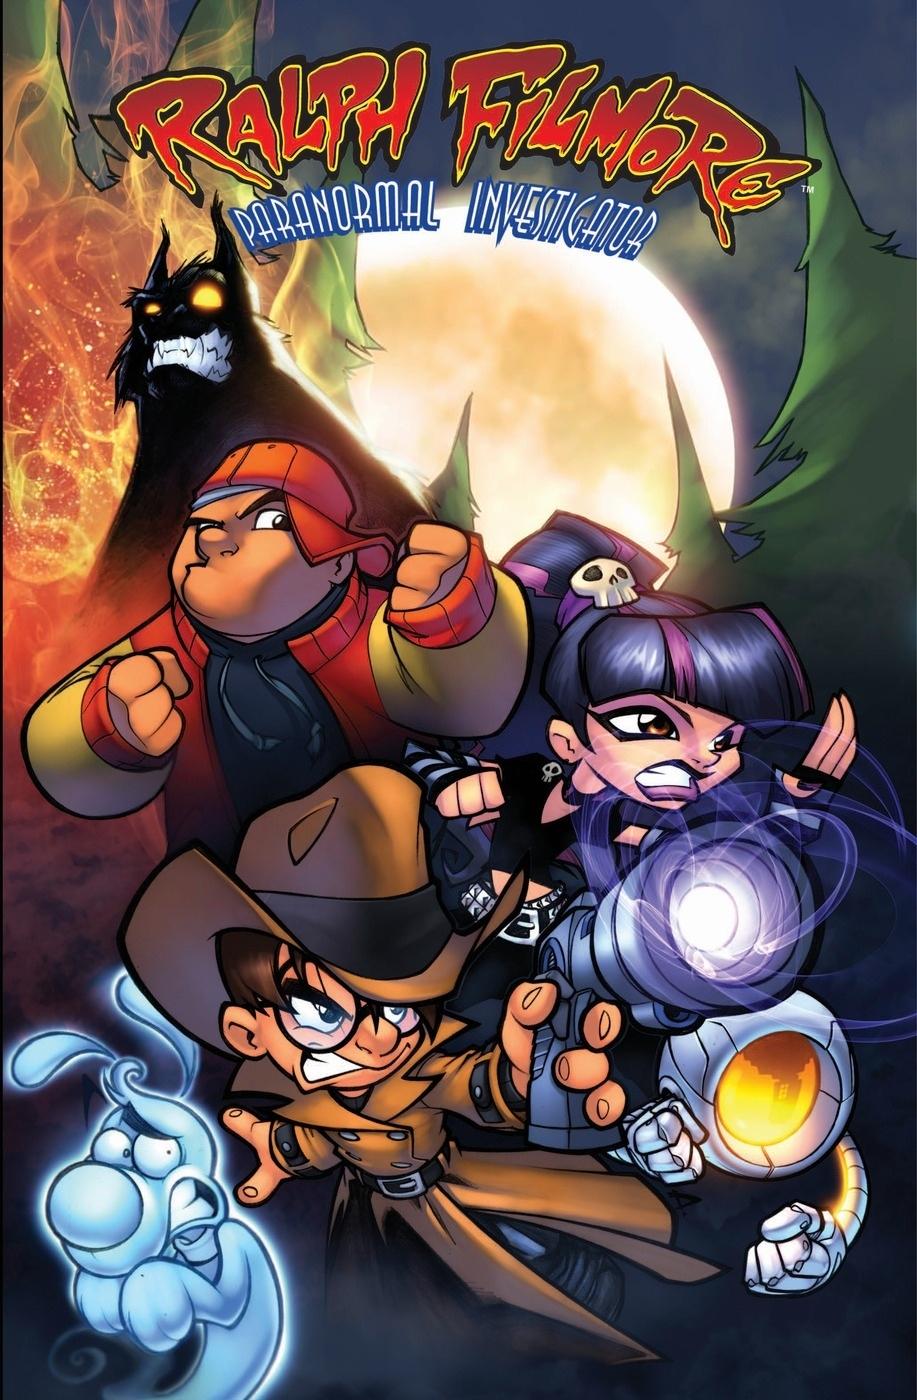 Read online Ralph Filmore comic -  Issue # Full - 1